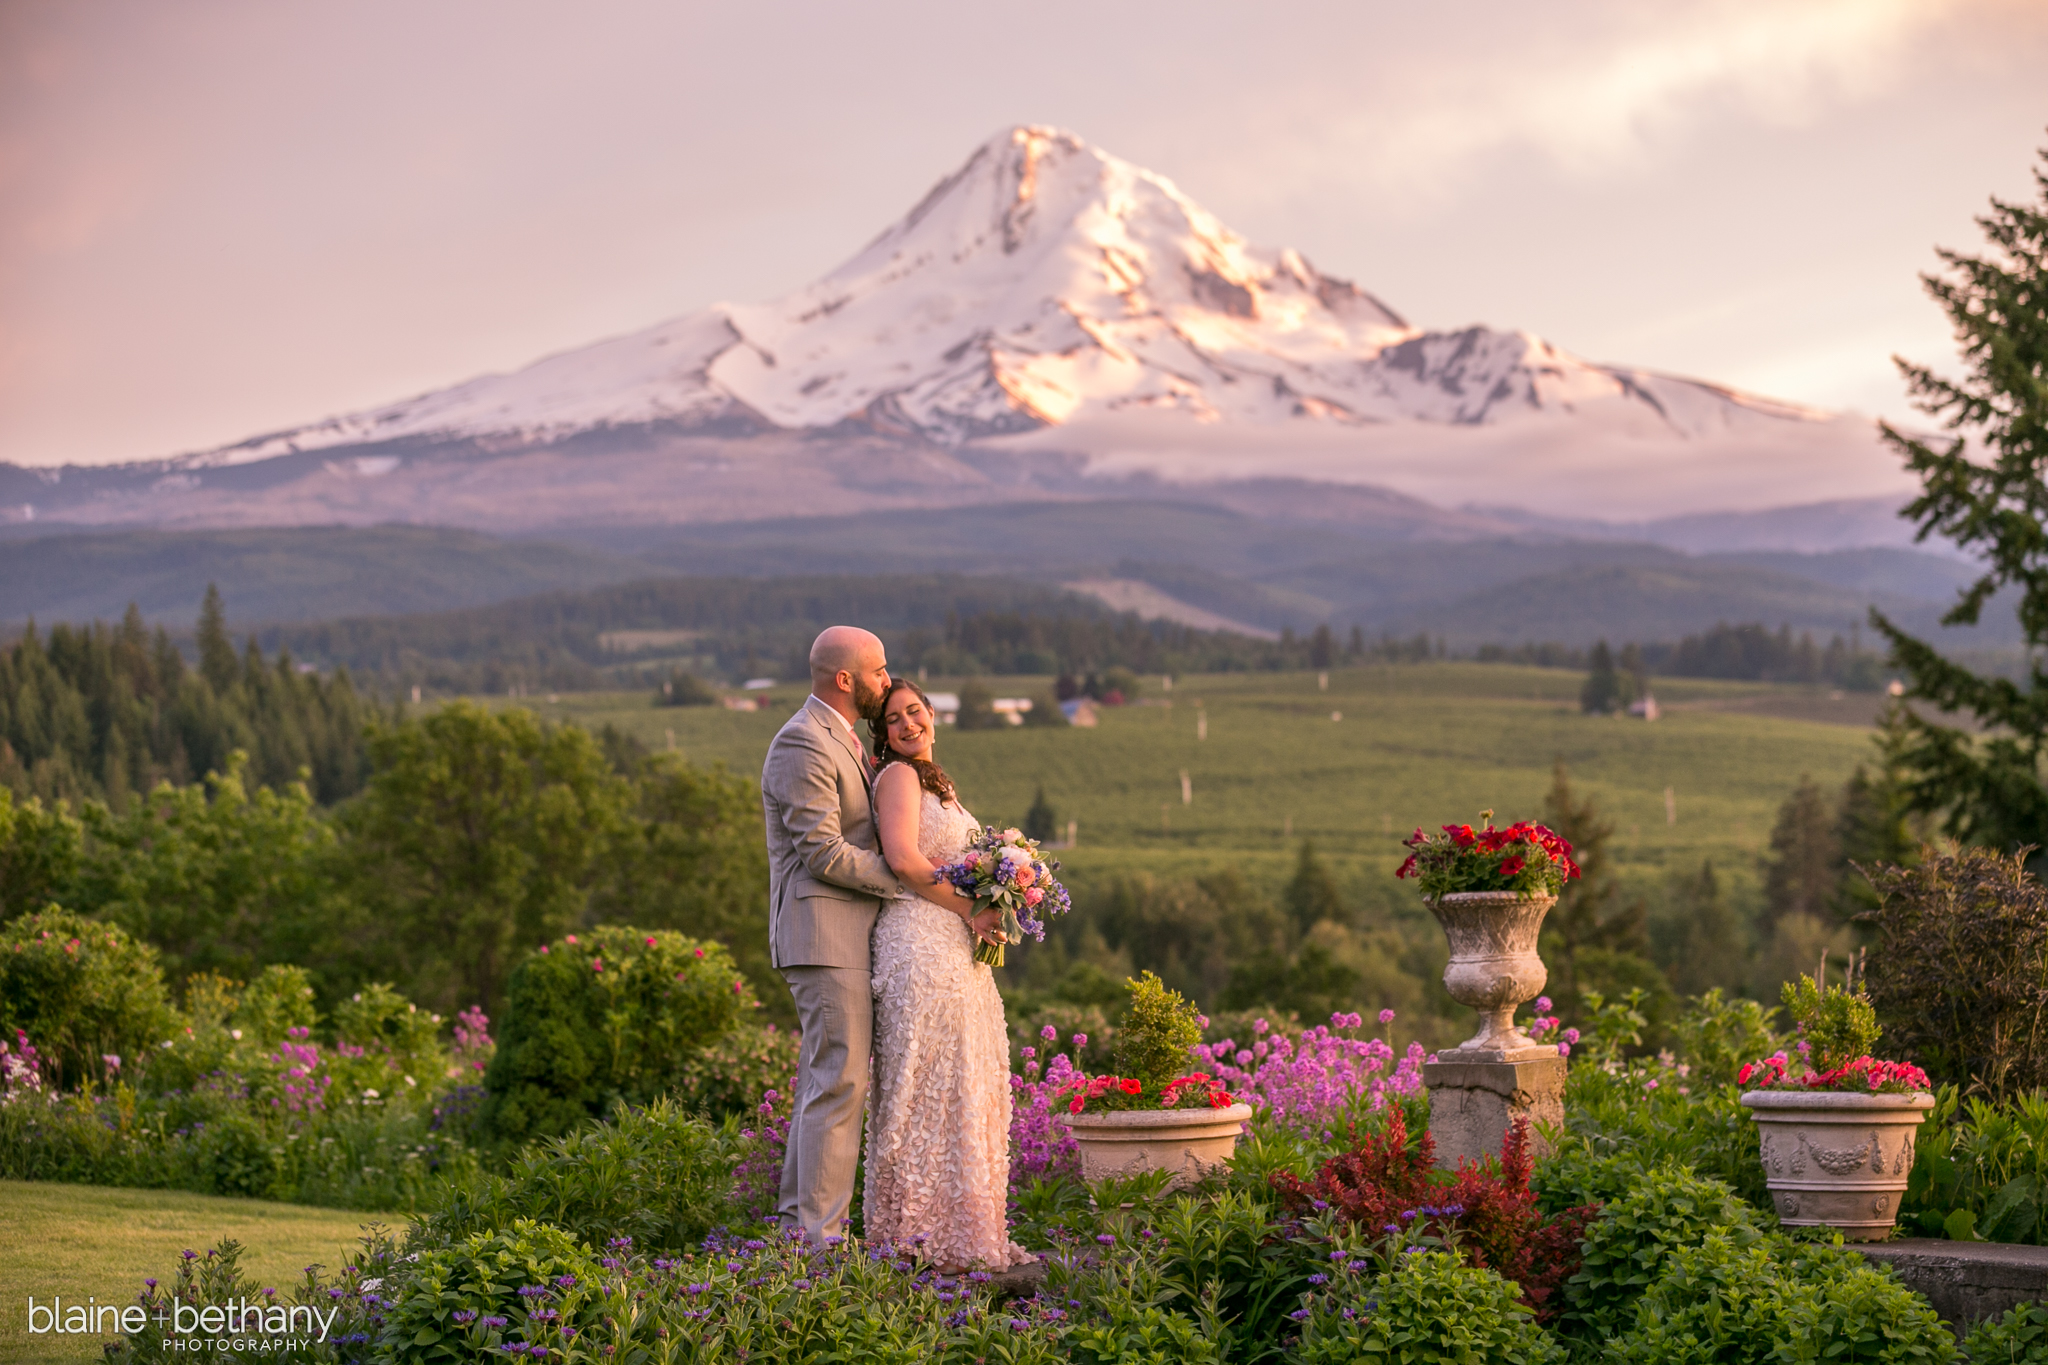 Bridalbliss.com   Portland Wedding   Oregon Event Planning and Design   Blaine & Bethany Photography